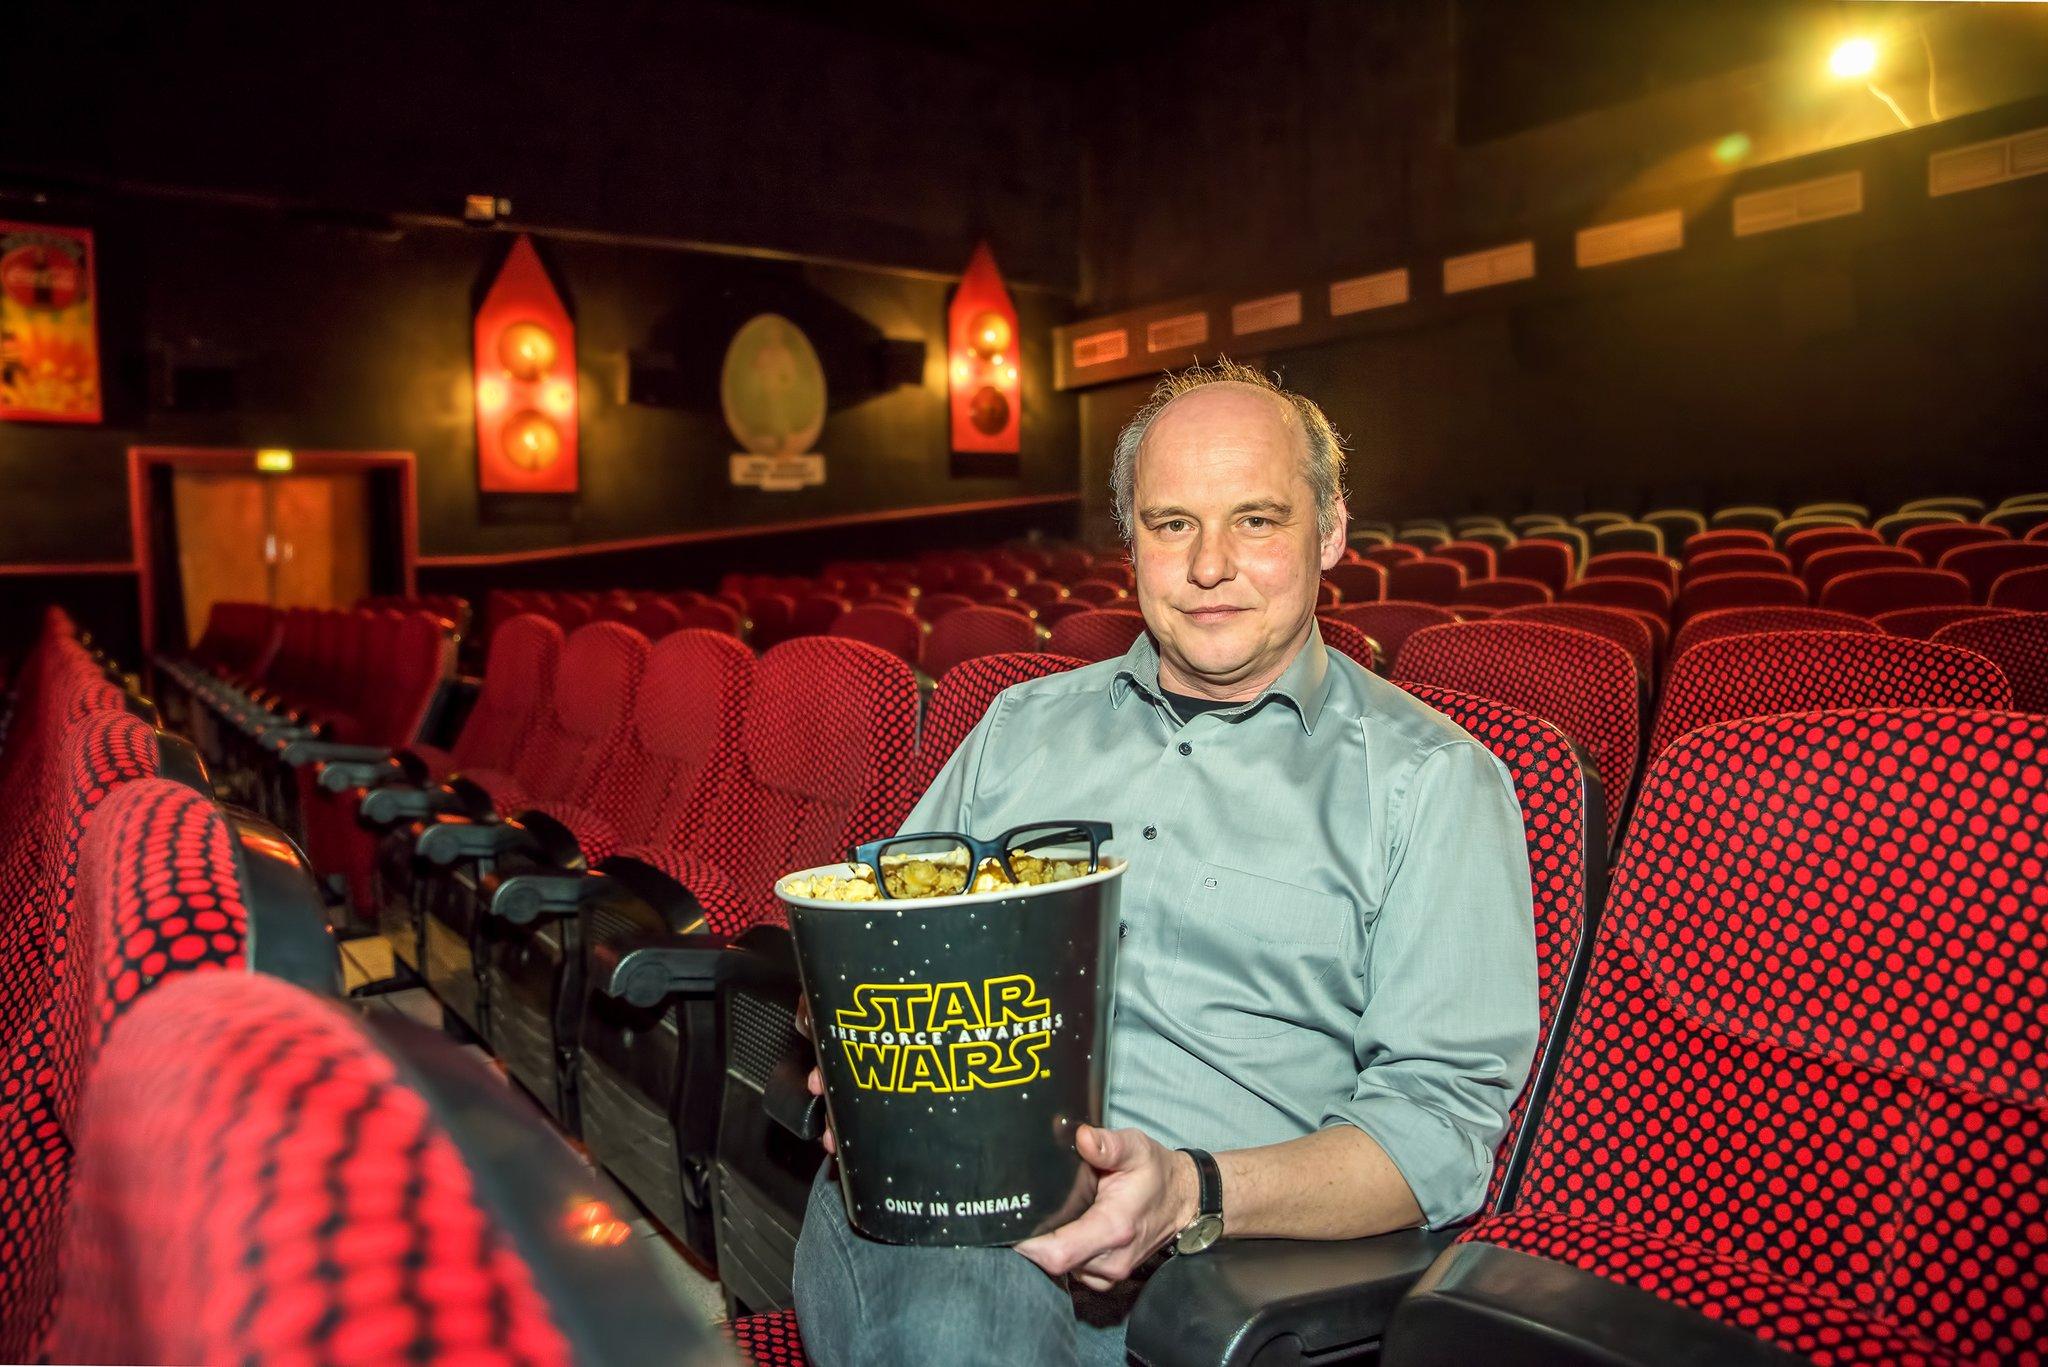 Rex Kino Langenfeld